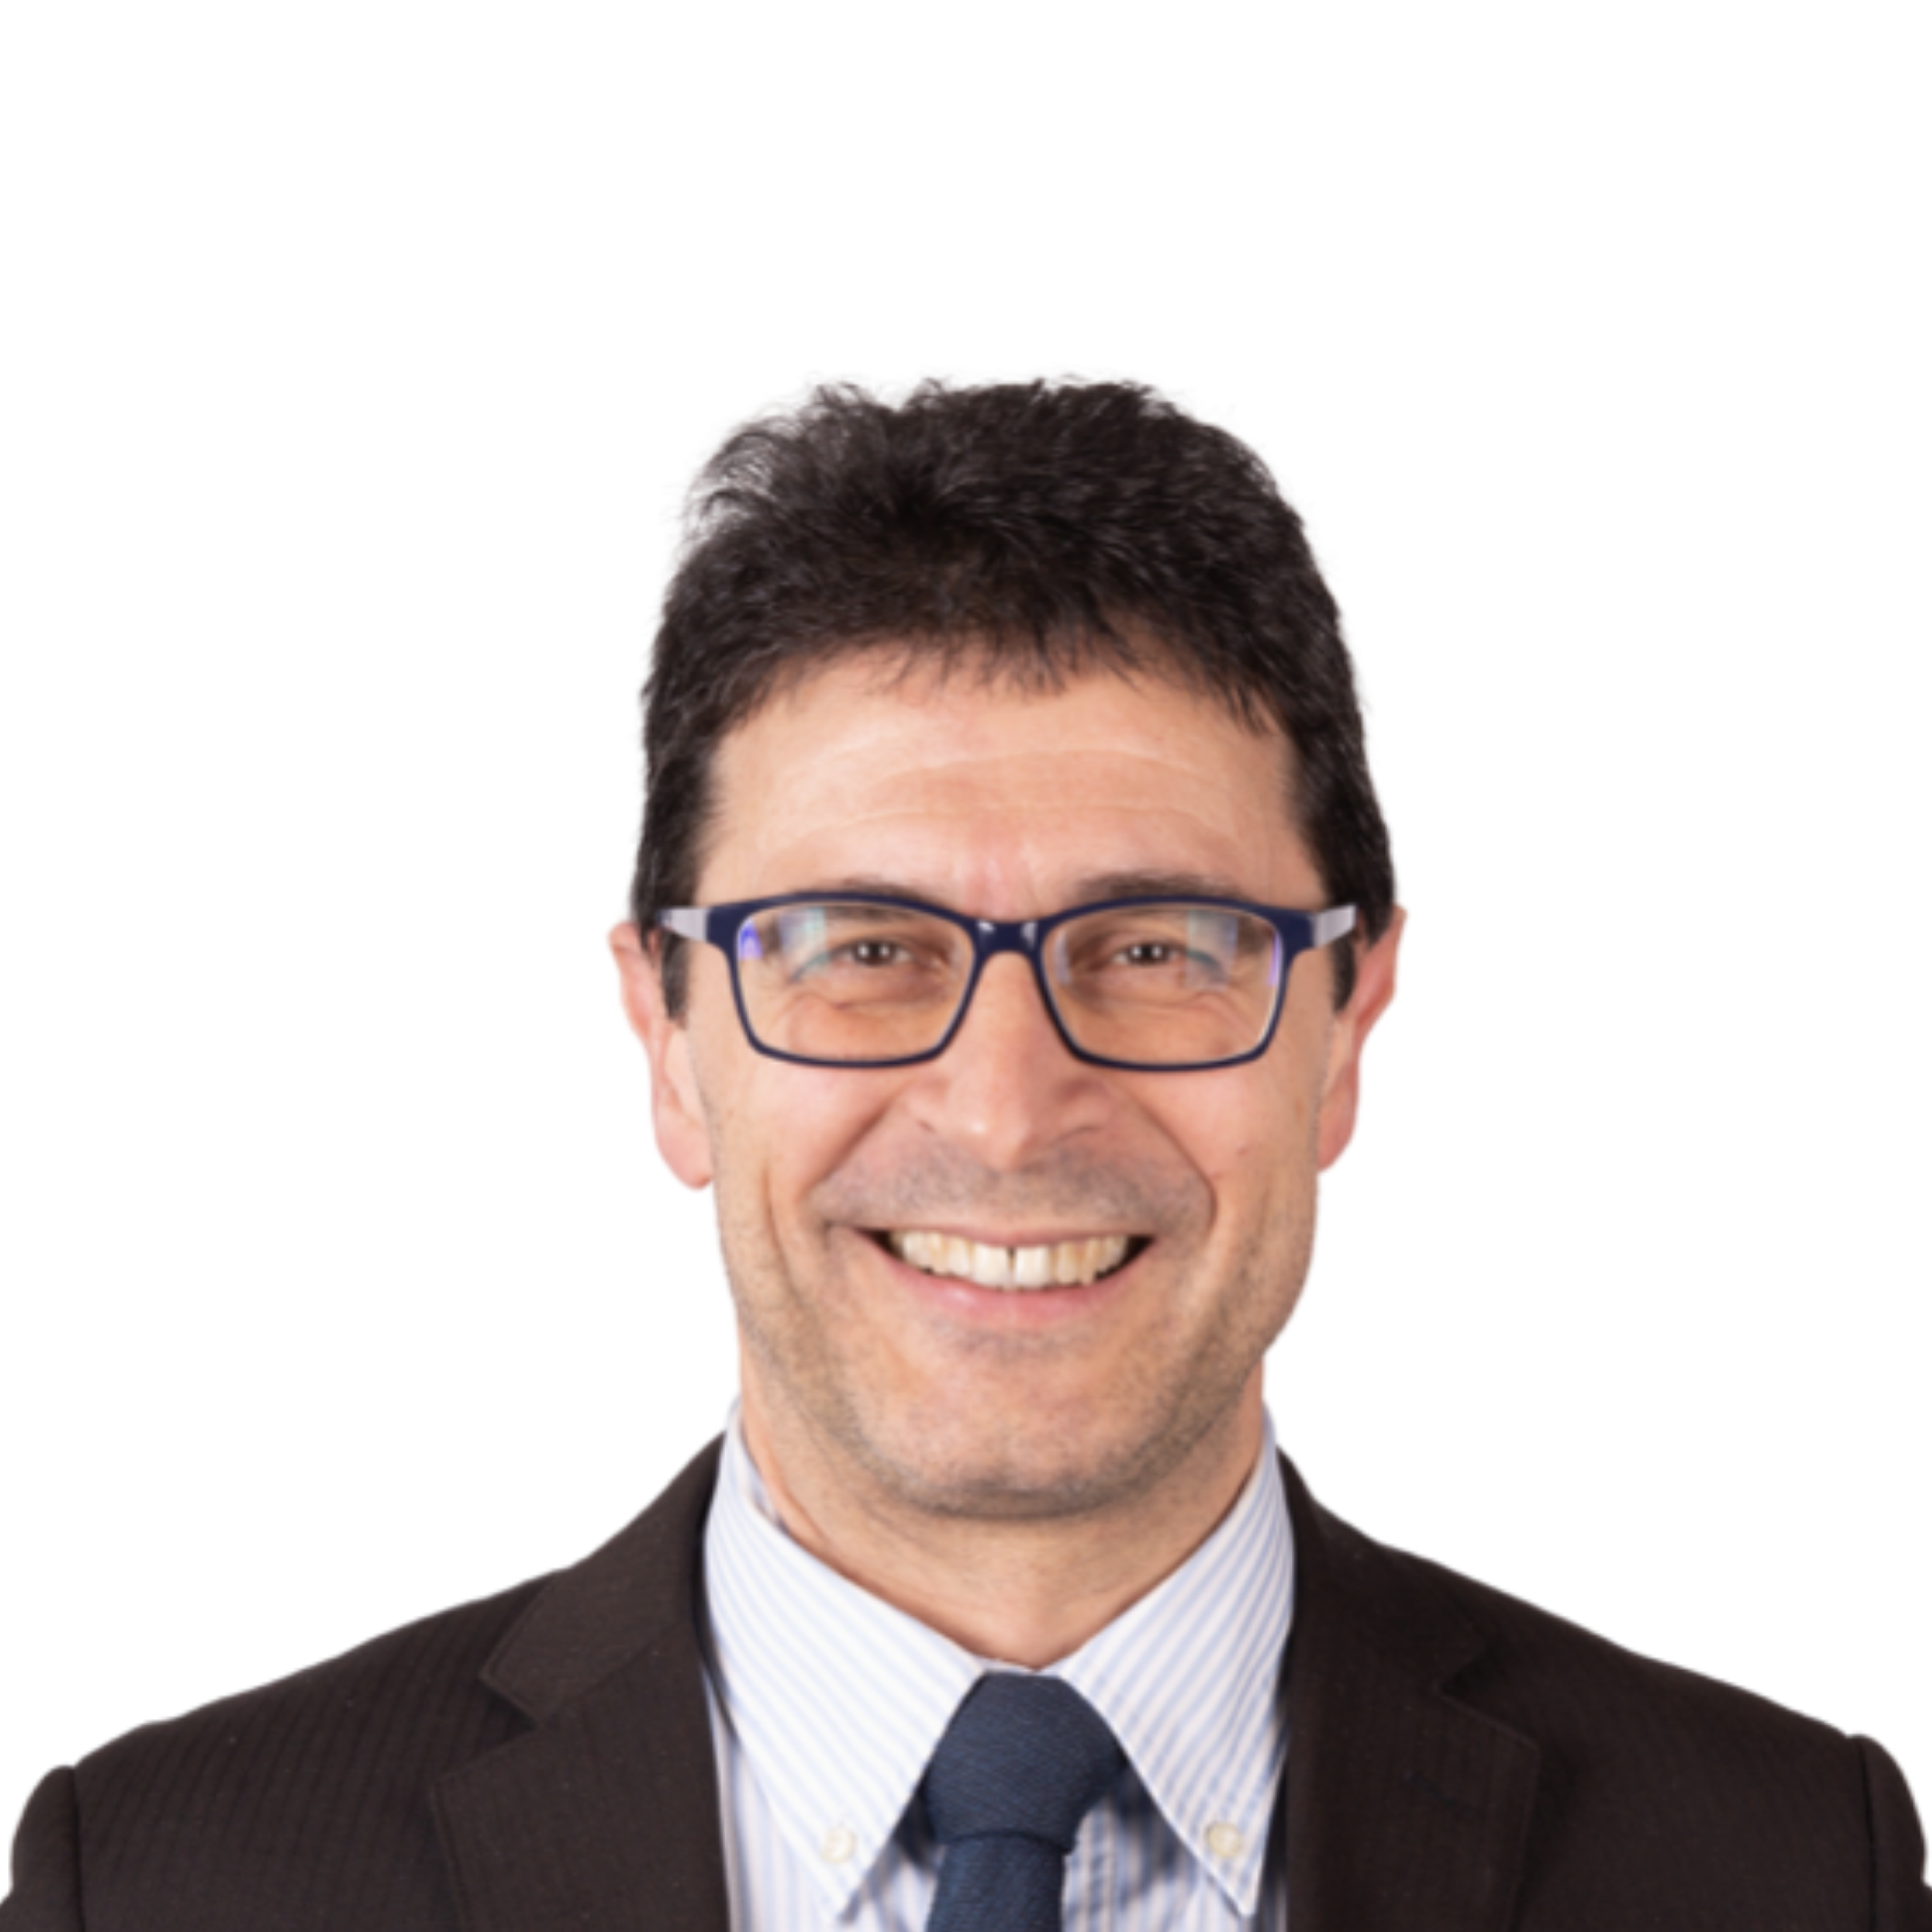 Armando Persico